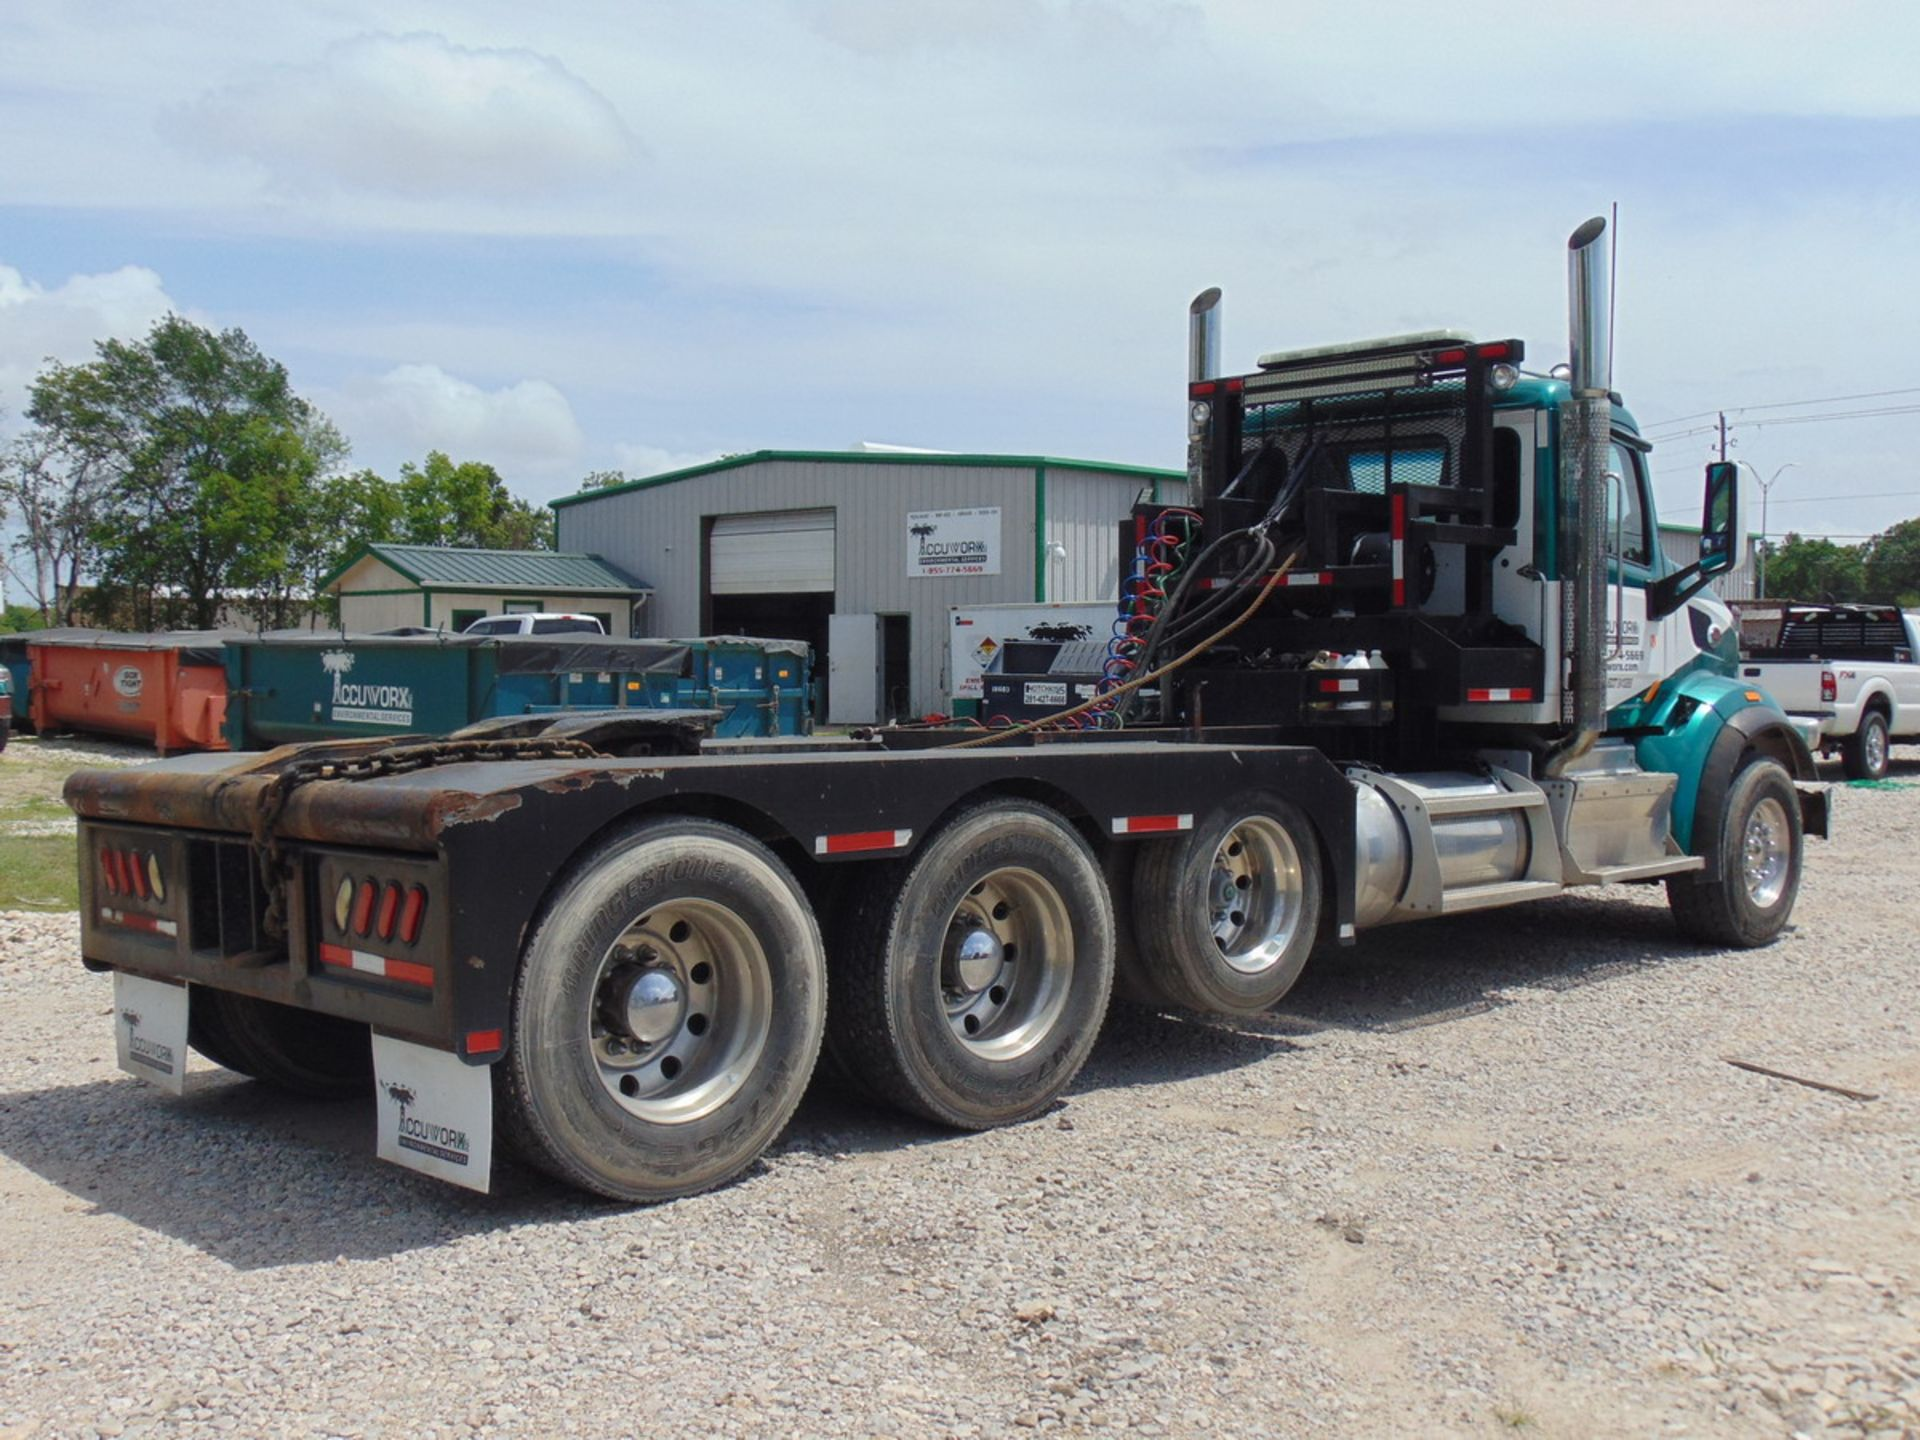 Lot 25 - 2014 Peterbilt 567 Tri/A Truck Tractor, Adjustable Fifth Wheel Miles: 225,666; Engine: 2013